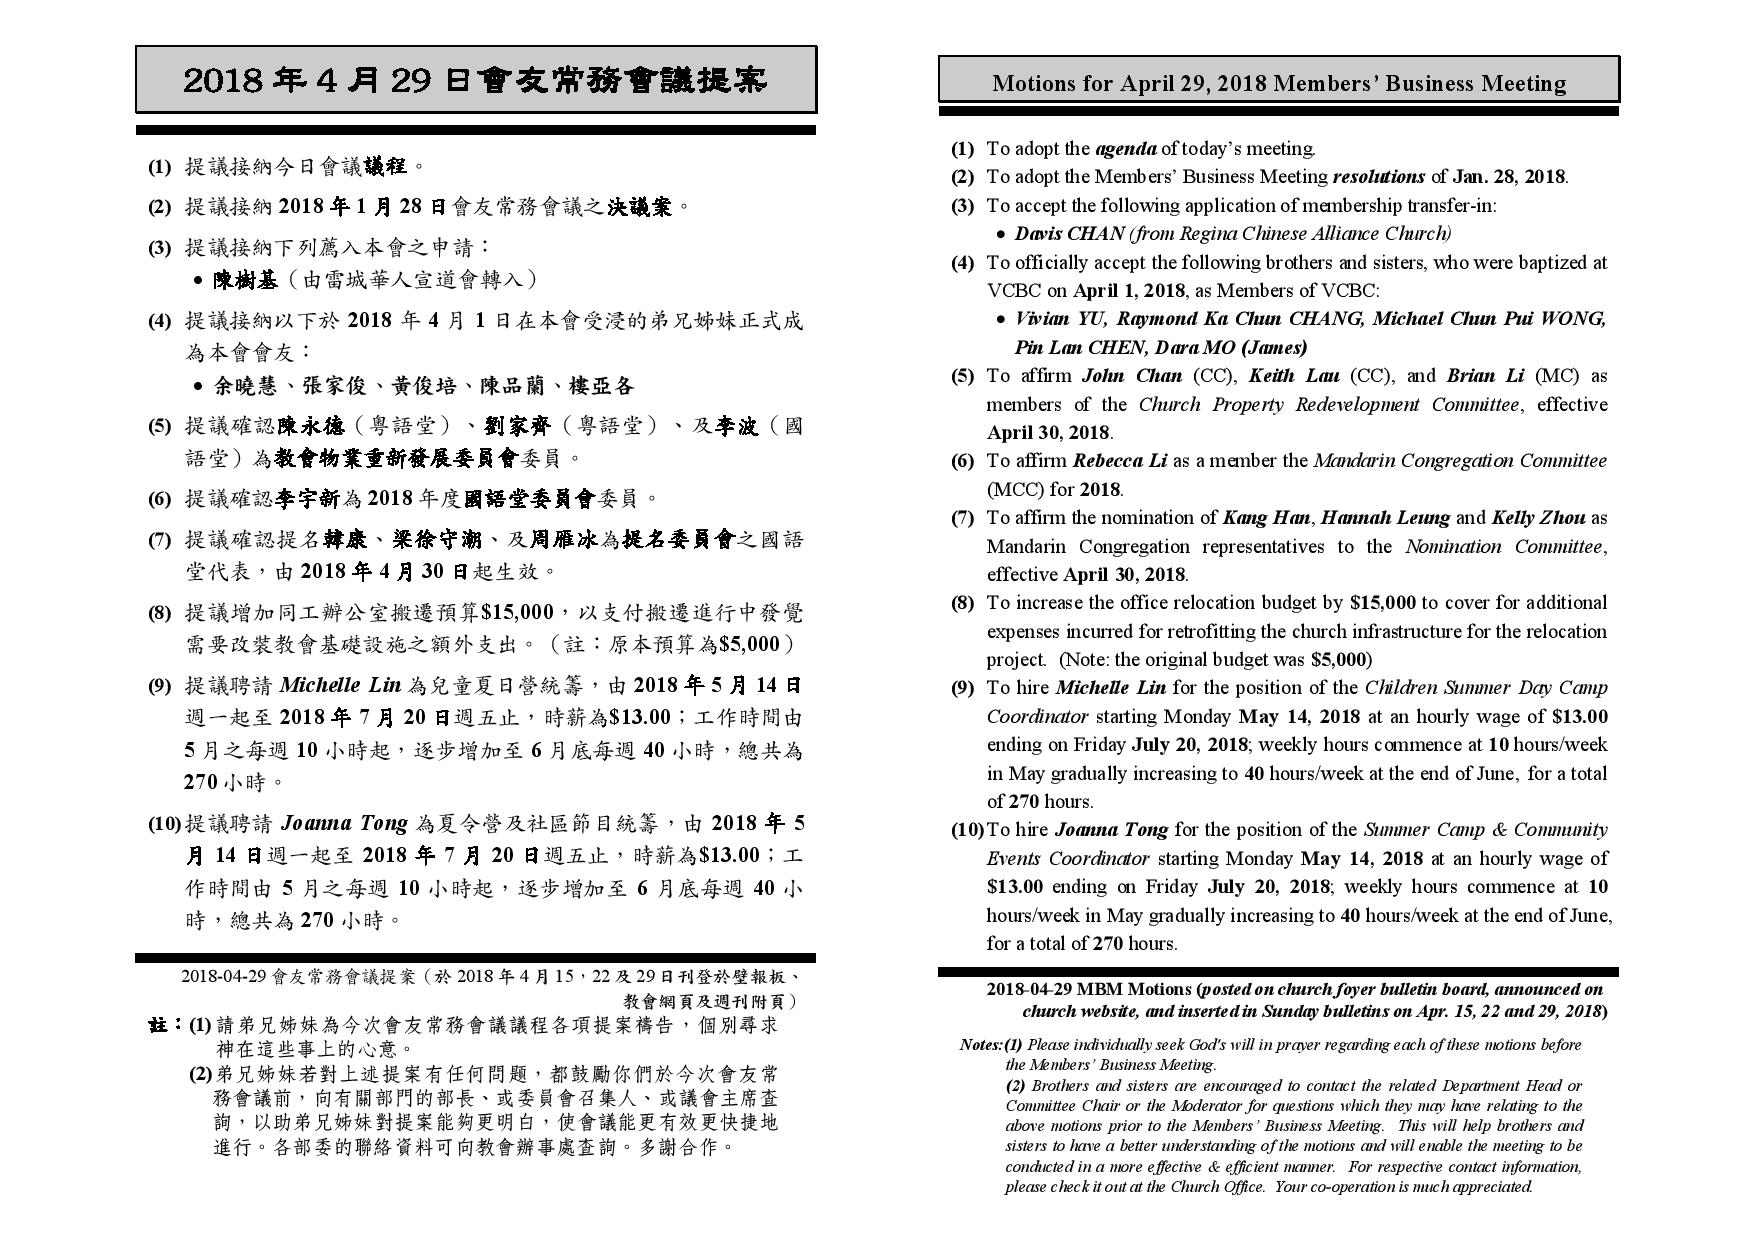 2018-04-29 MBM Motions C+E-page-001